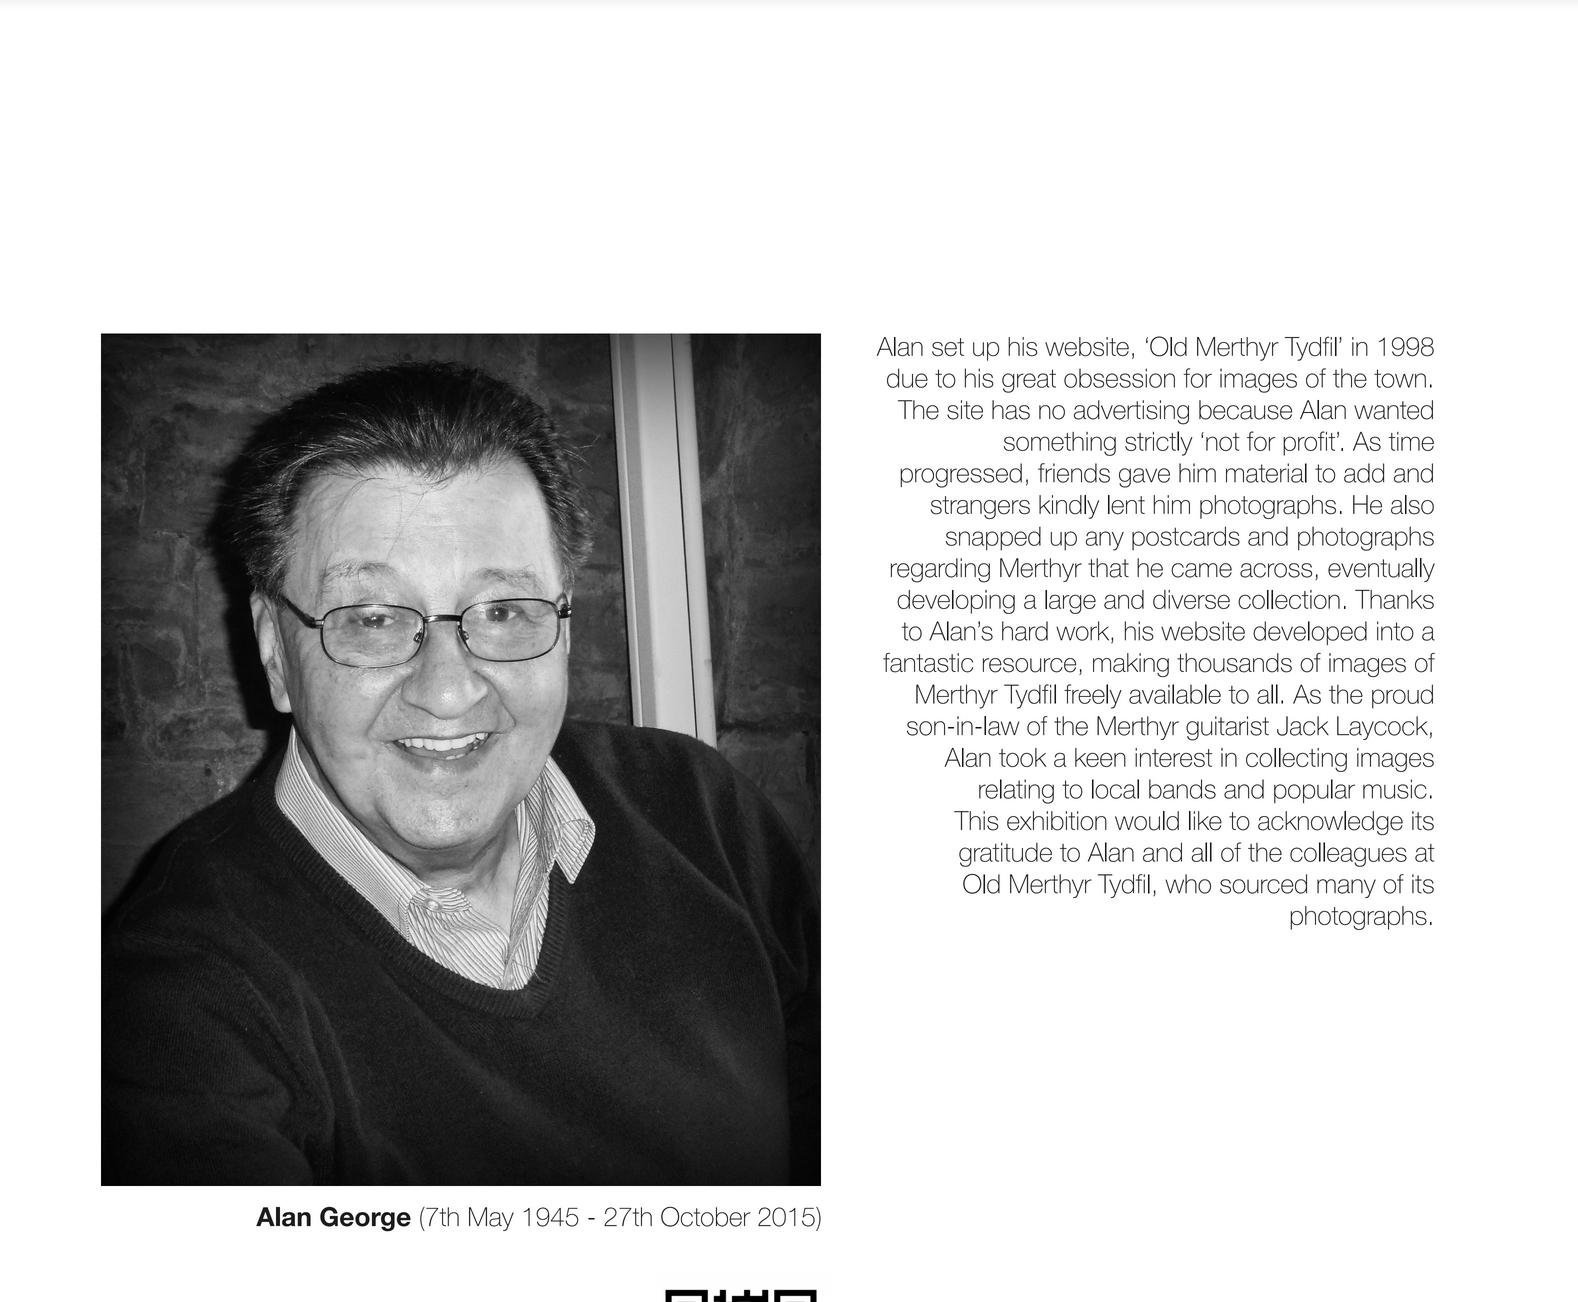 Tribute to Alan George